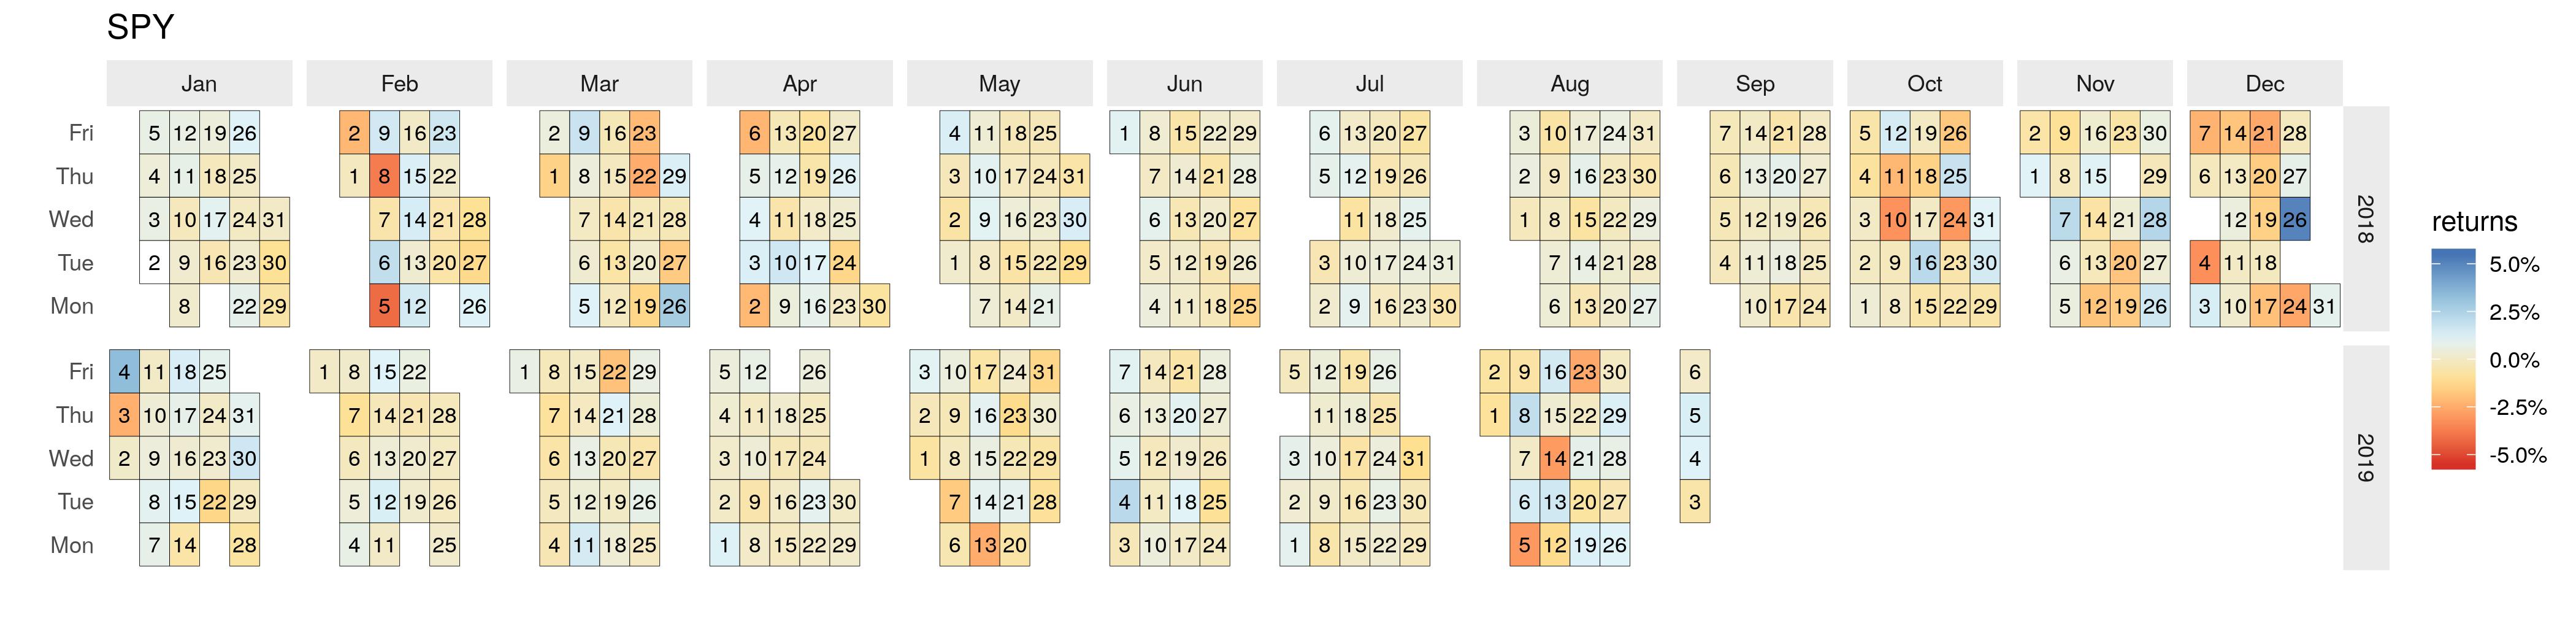 Calendar Heatmaps in ggplot